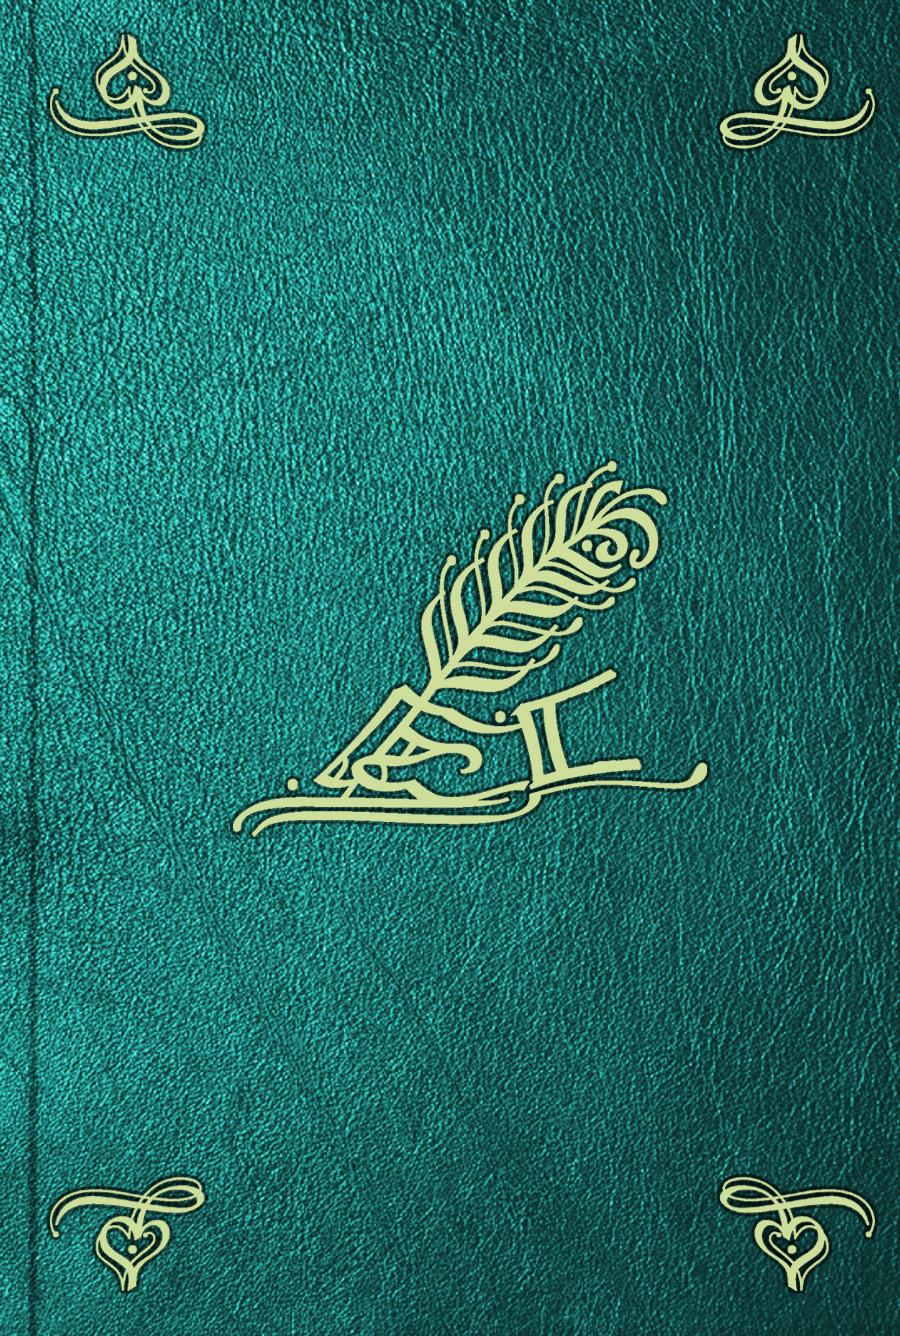 Diodorus Siculius Biblioteca storica. T. 5 dal dosso® перчатки